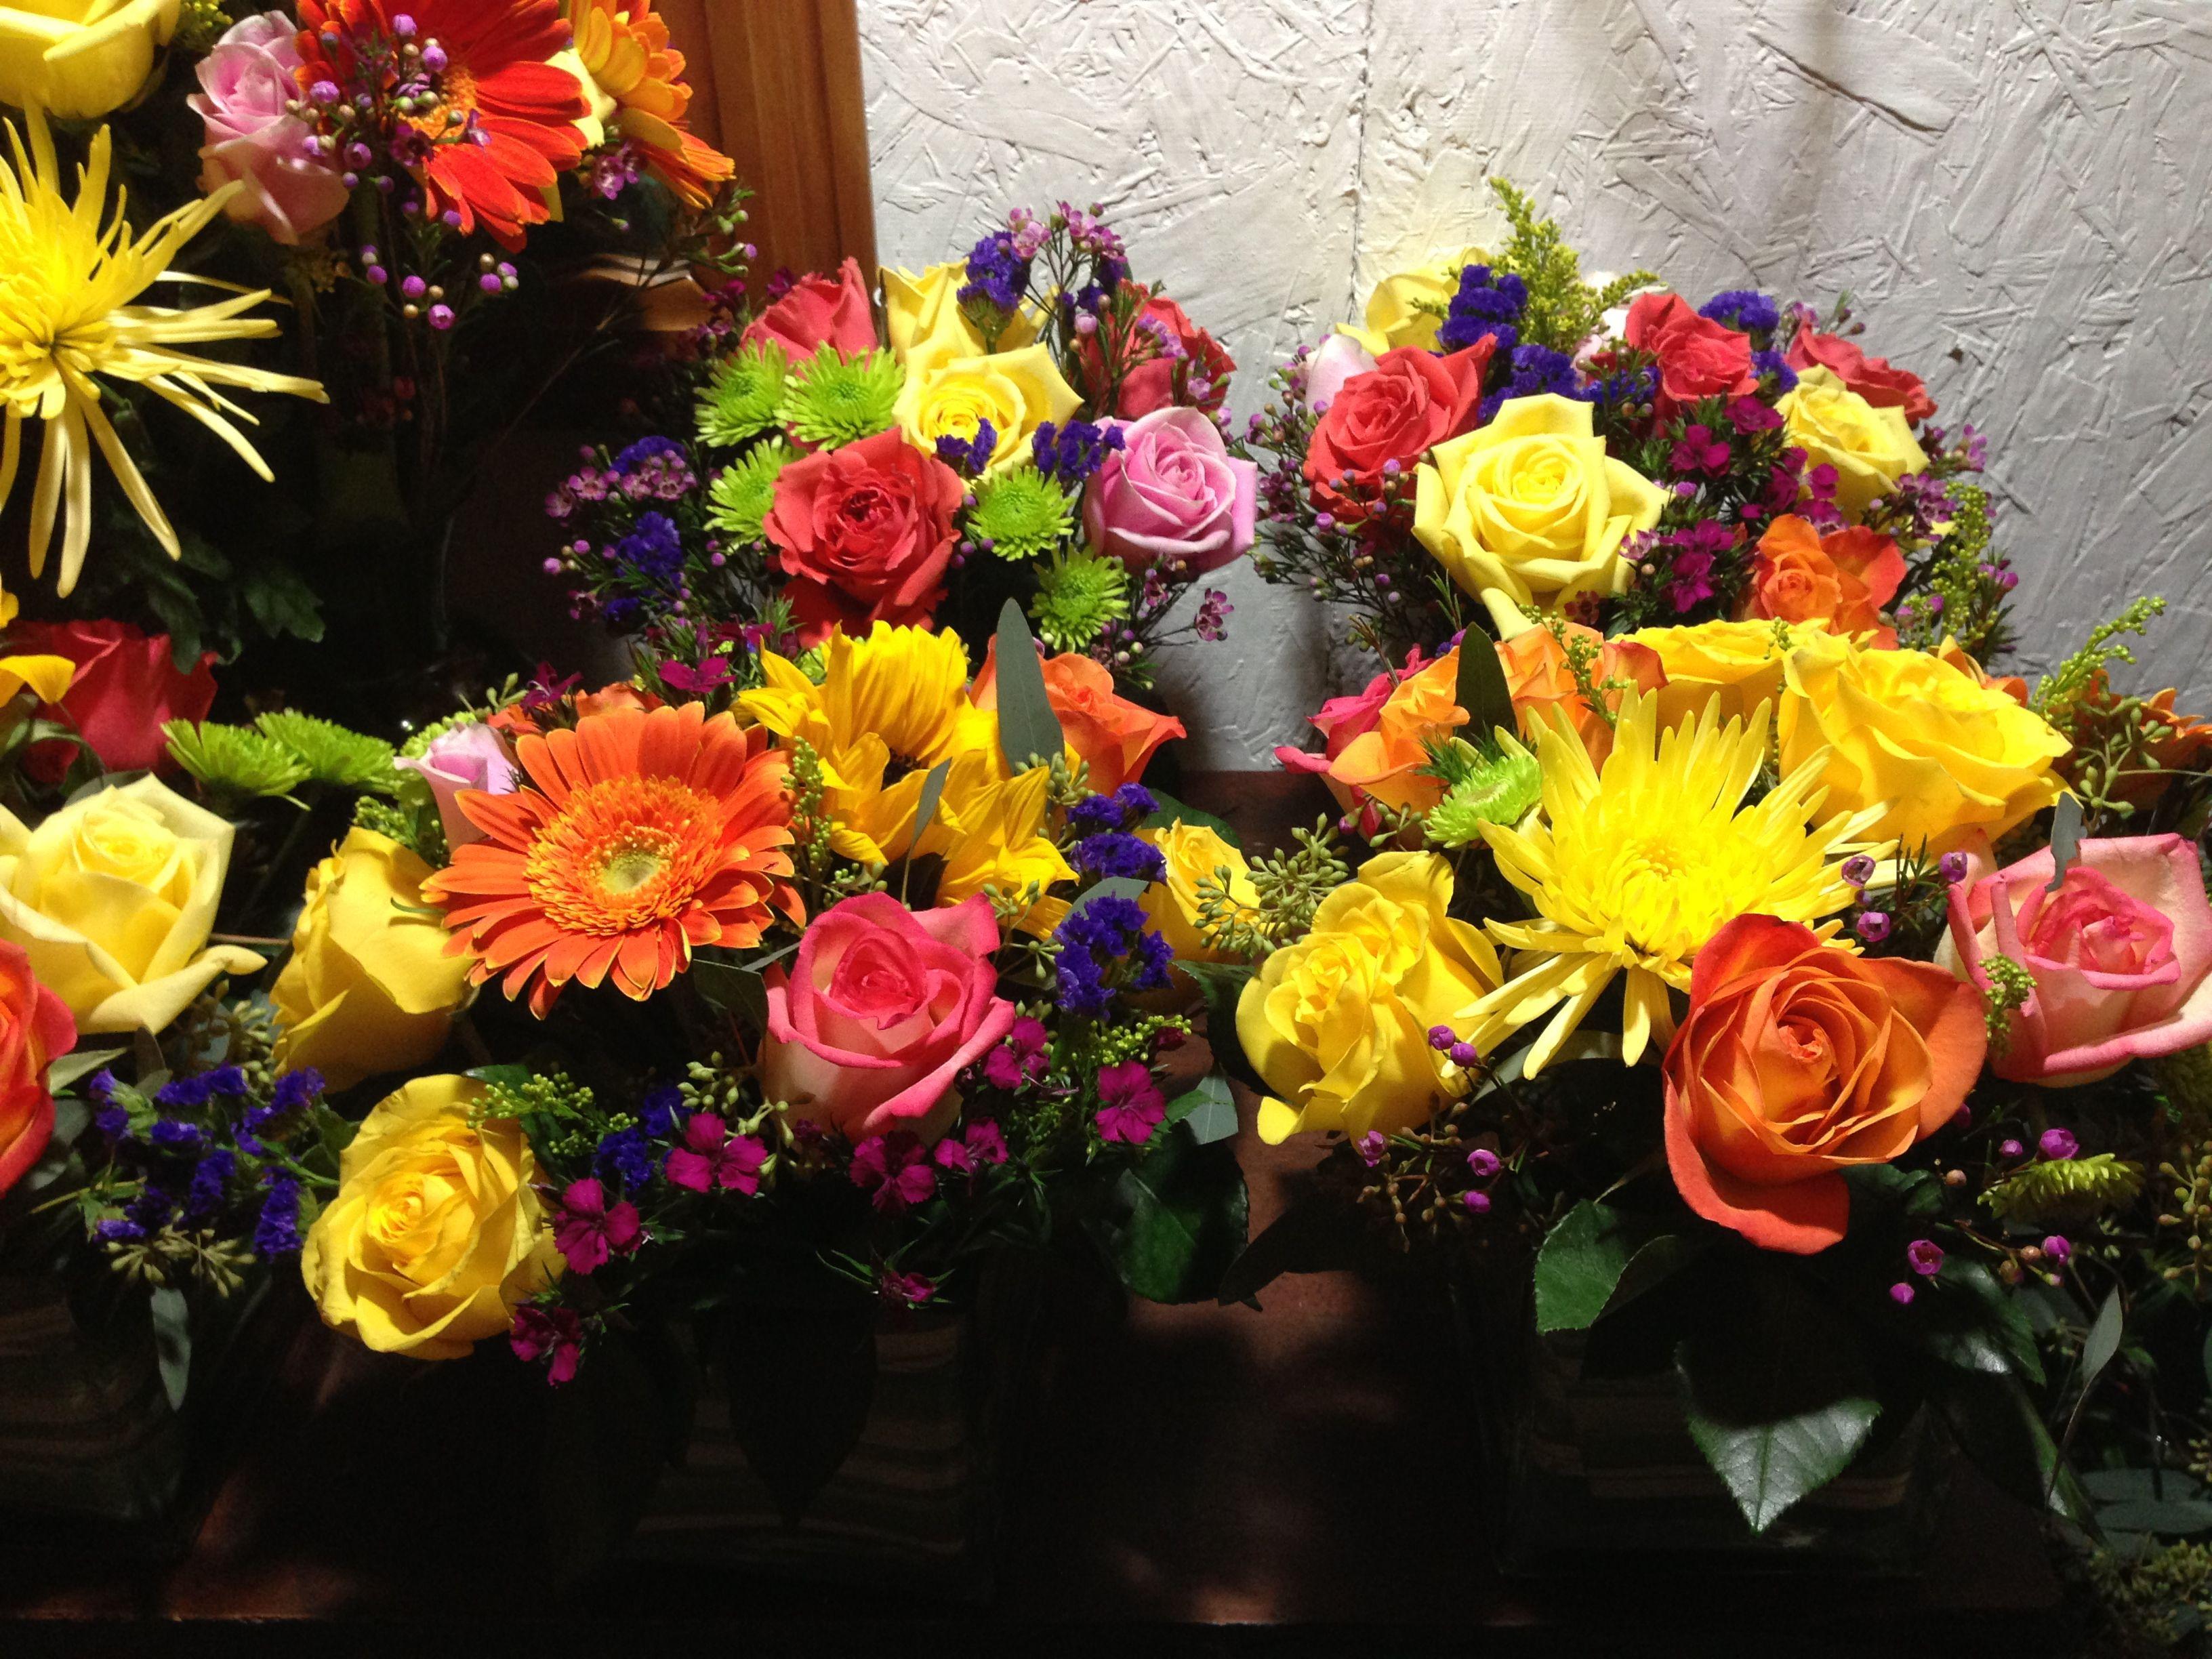 Arrangement costco flowers pinterest costco flowers costco flowers arrangement izmirmasajfo Images